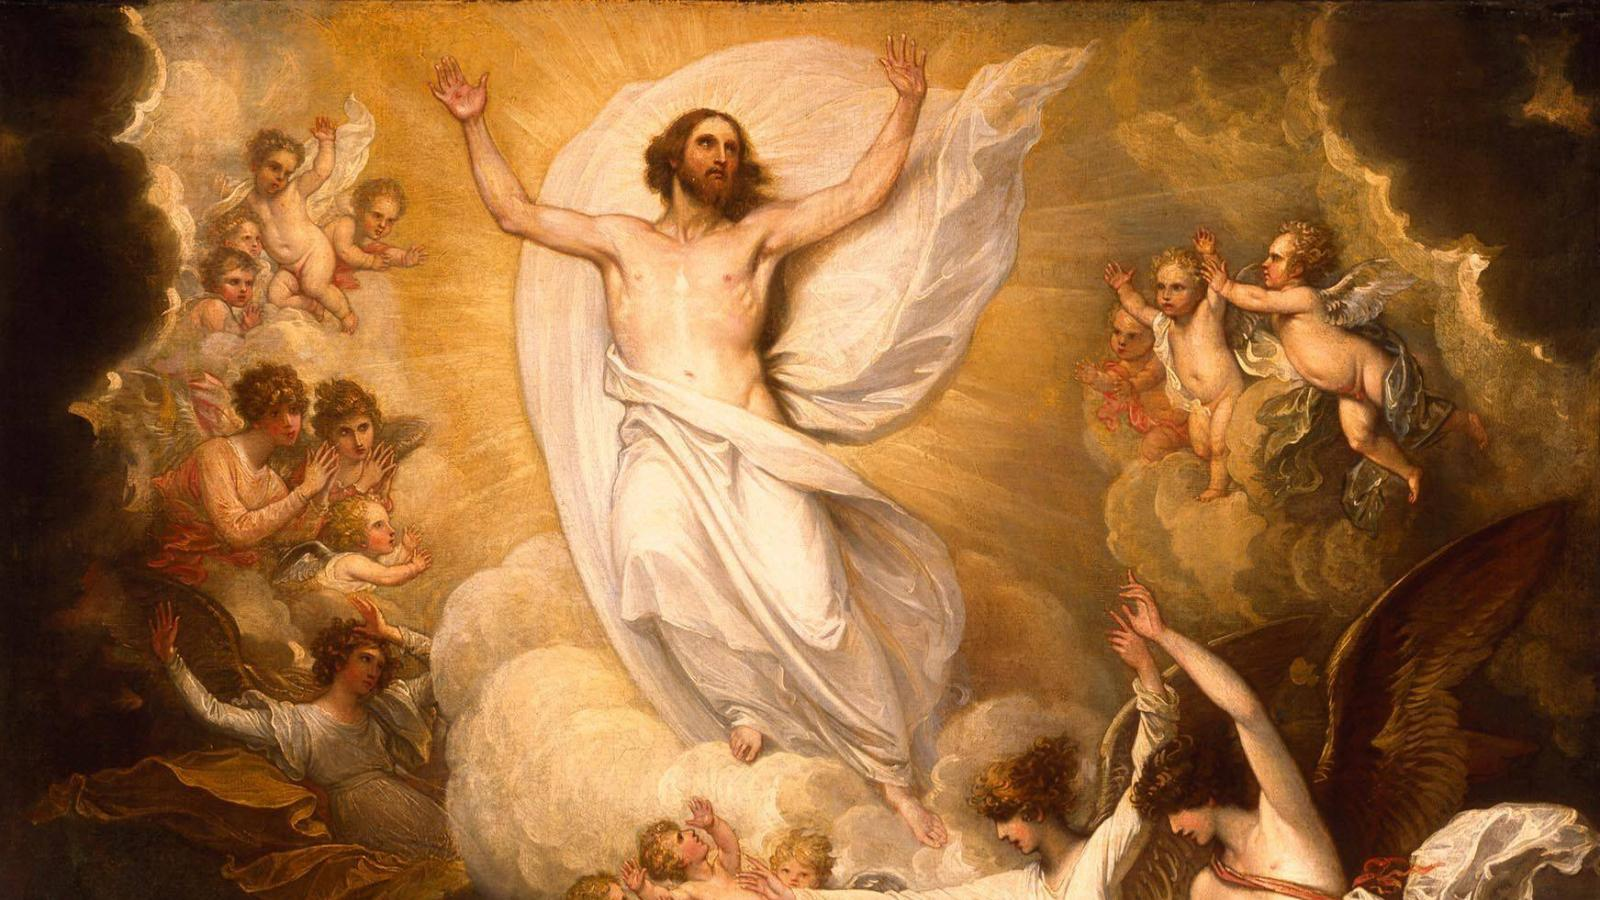 jesus resurrection wallpaper - photo #22